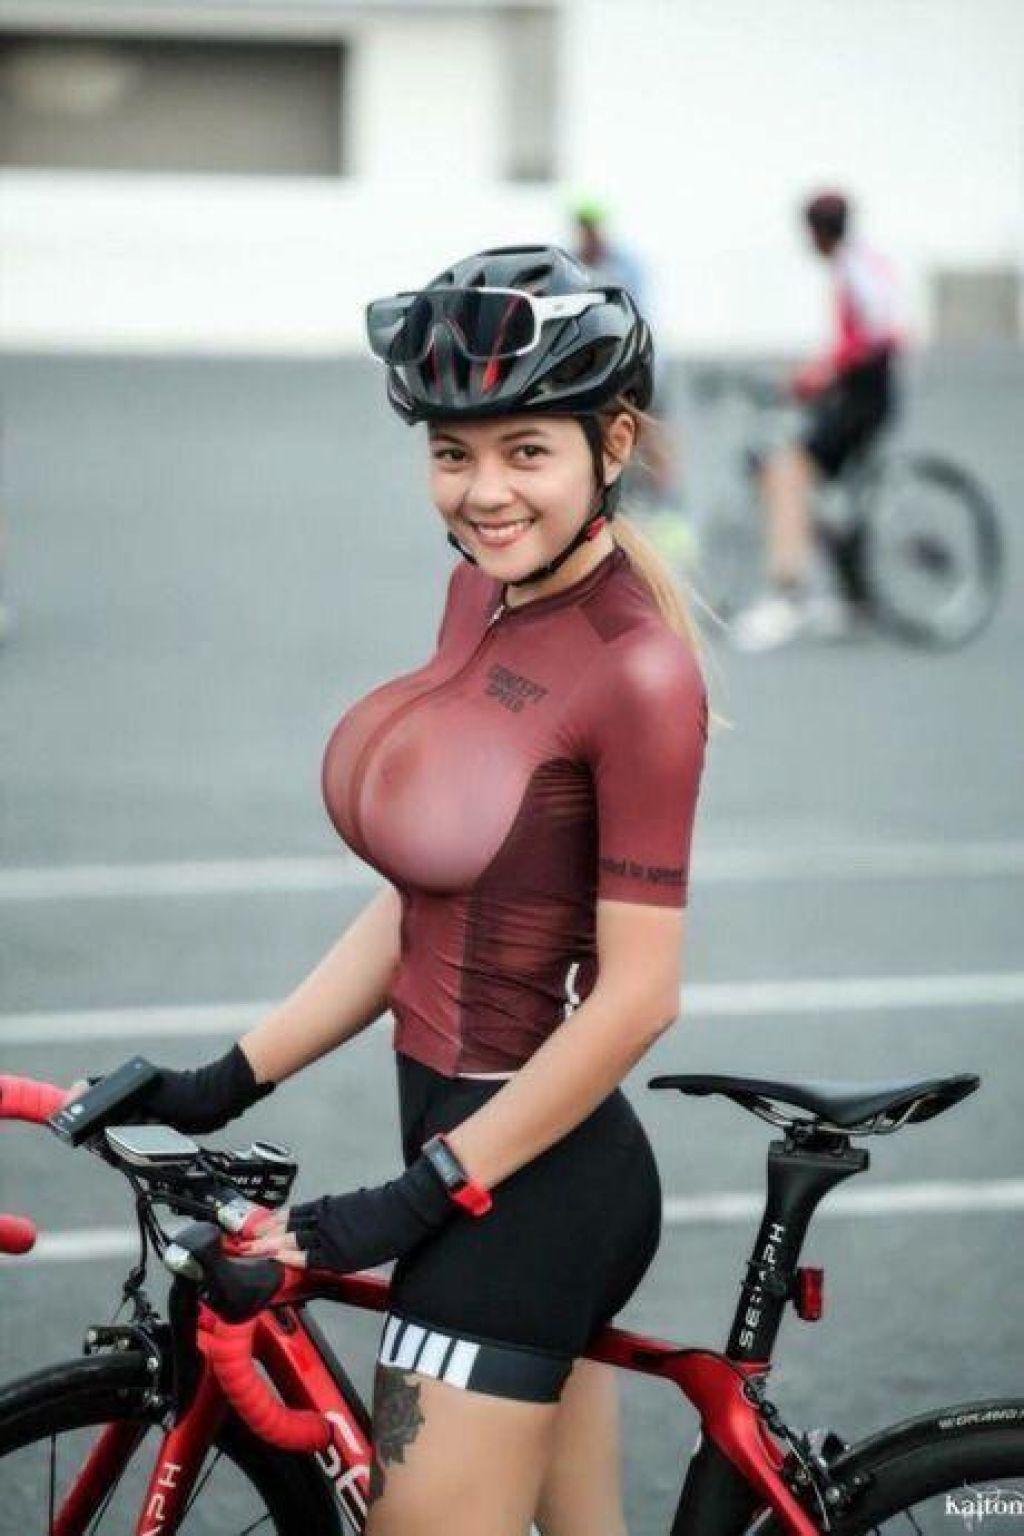 Fotogalerija zanimivih kolesark